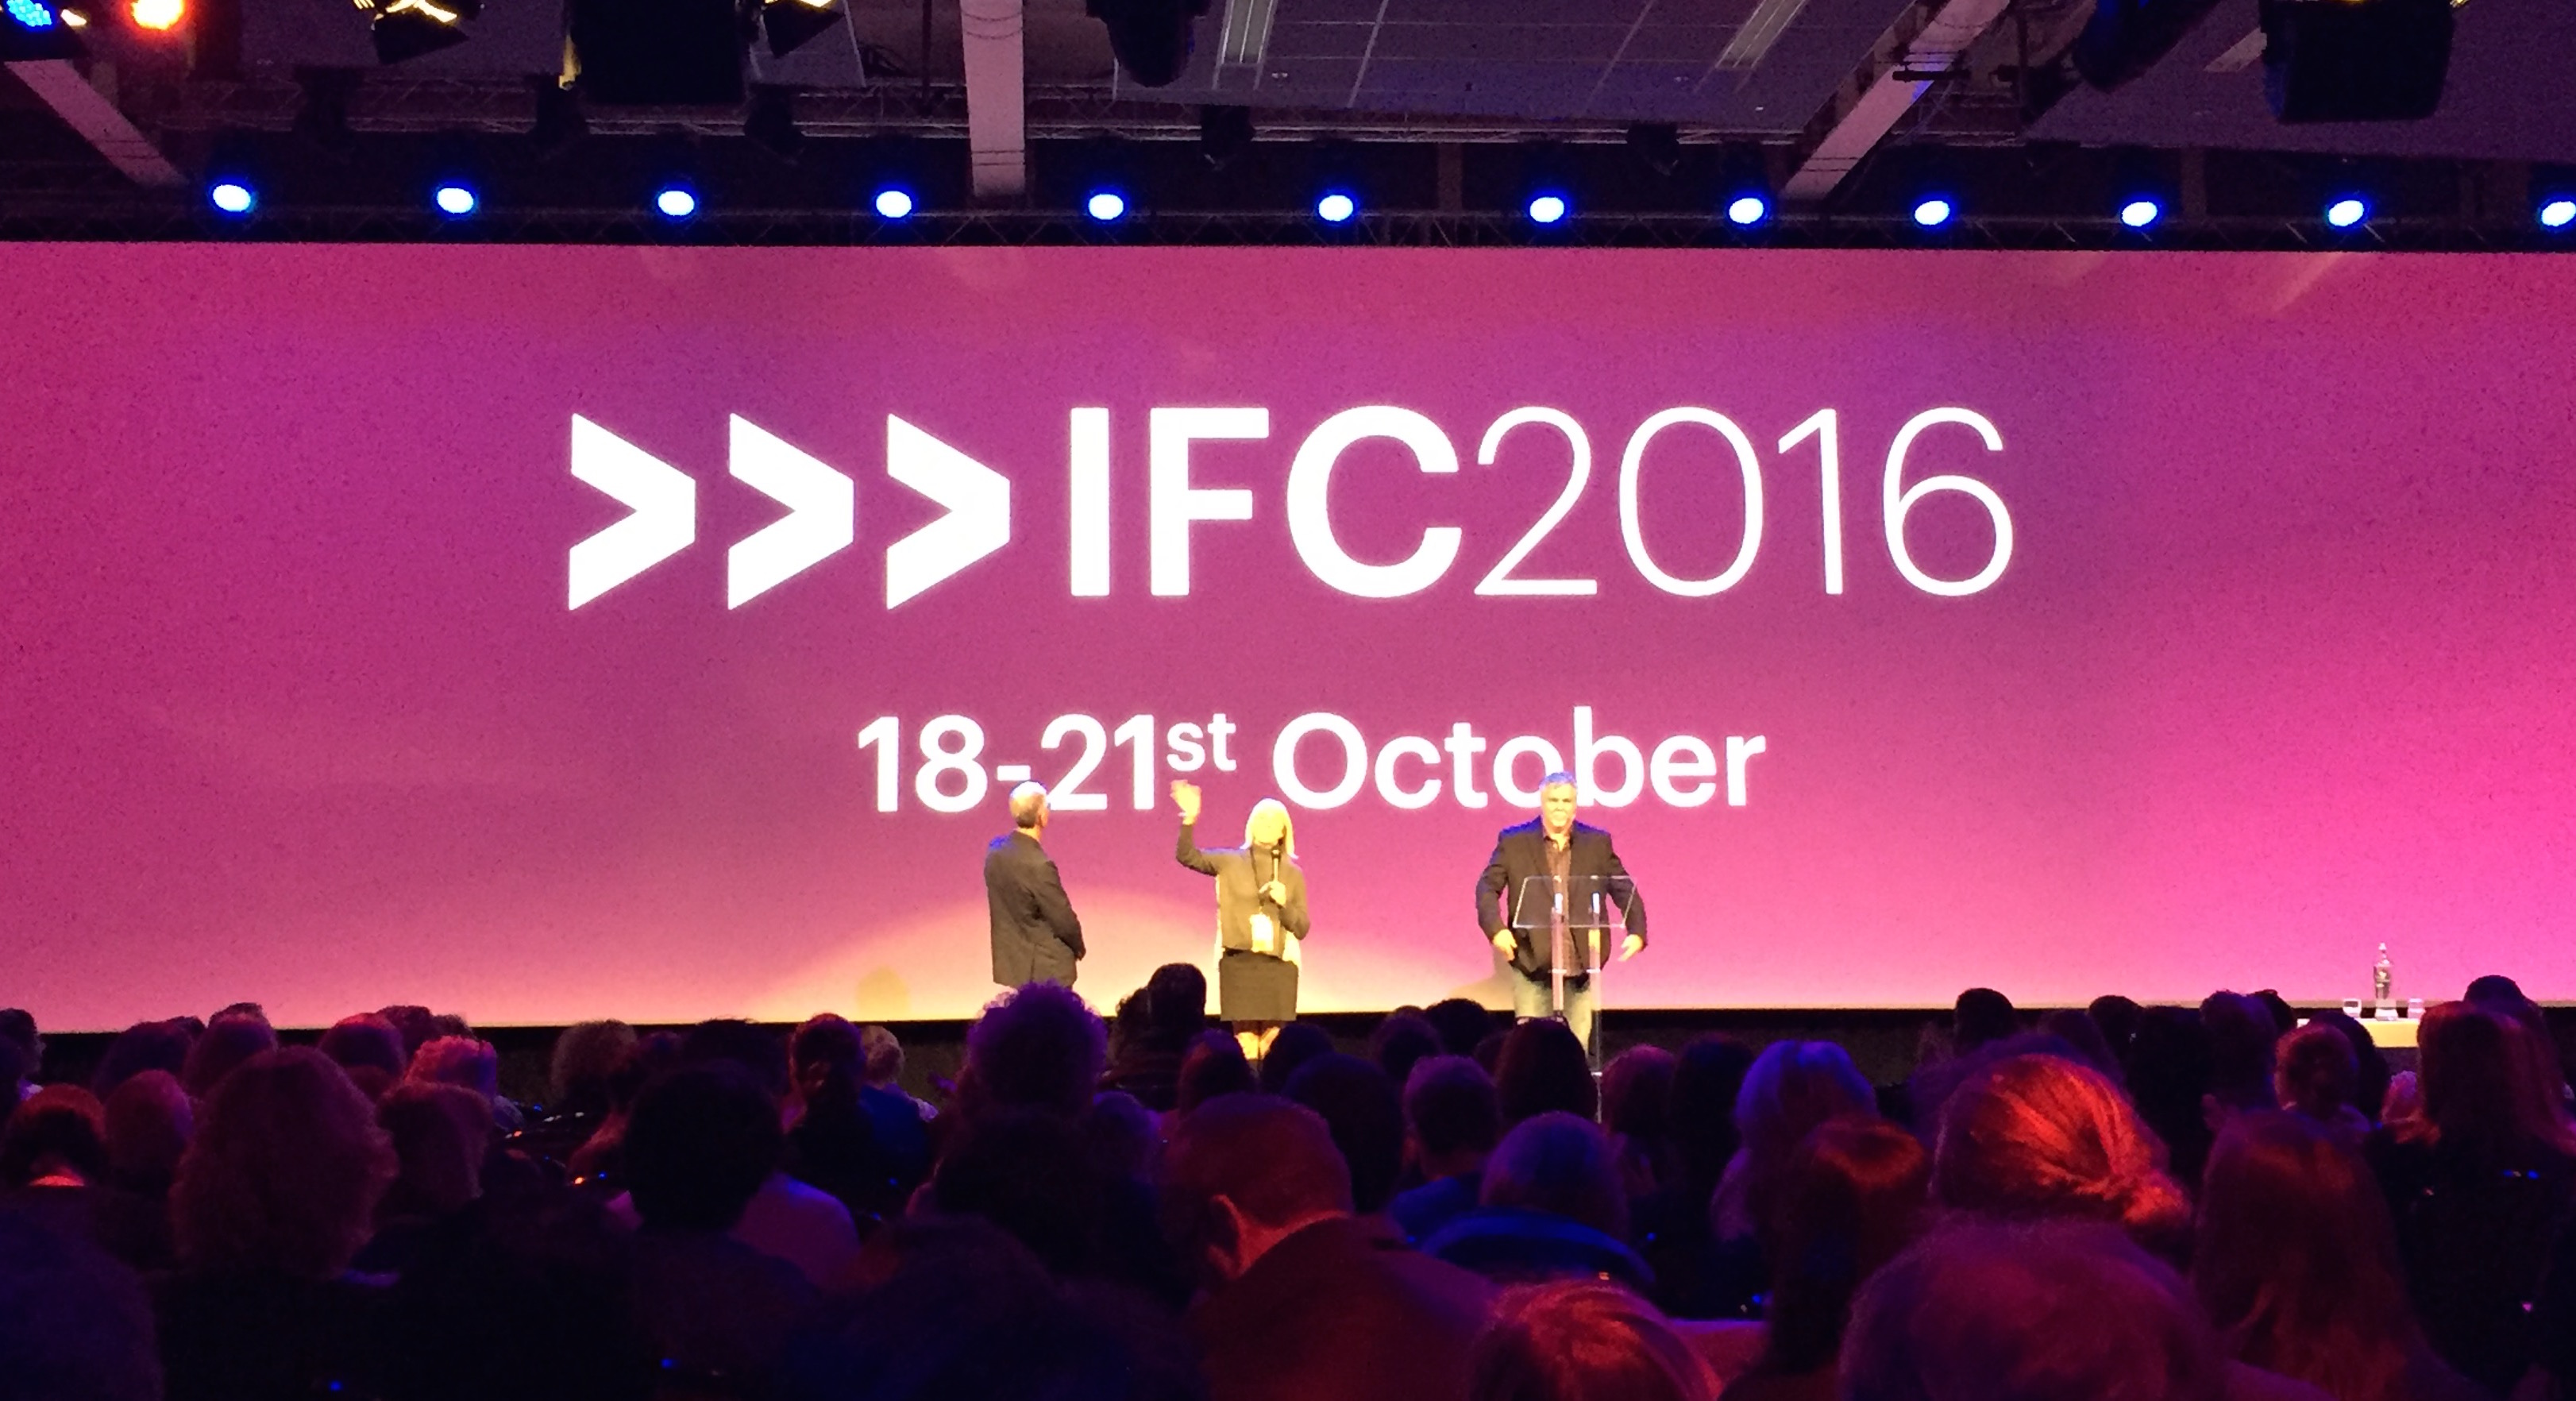 IFC 2016